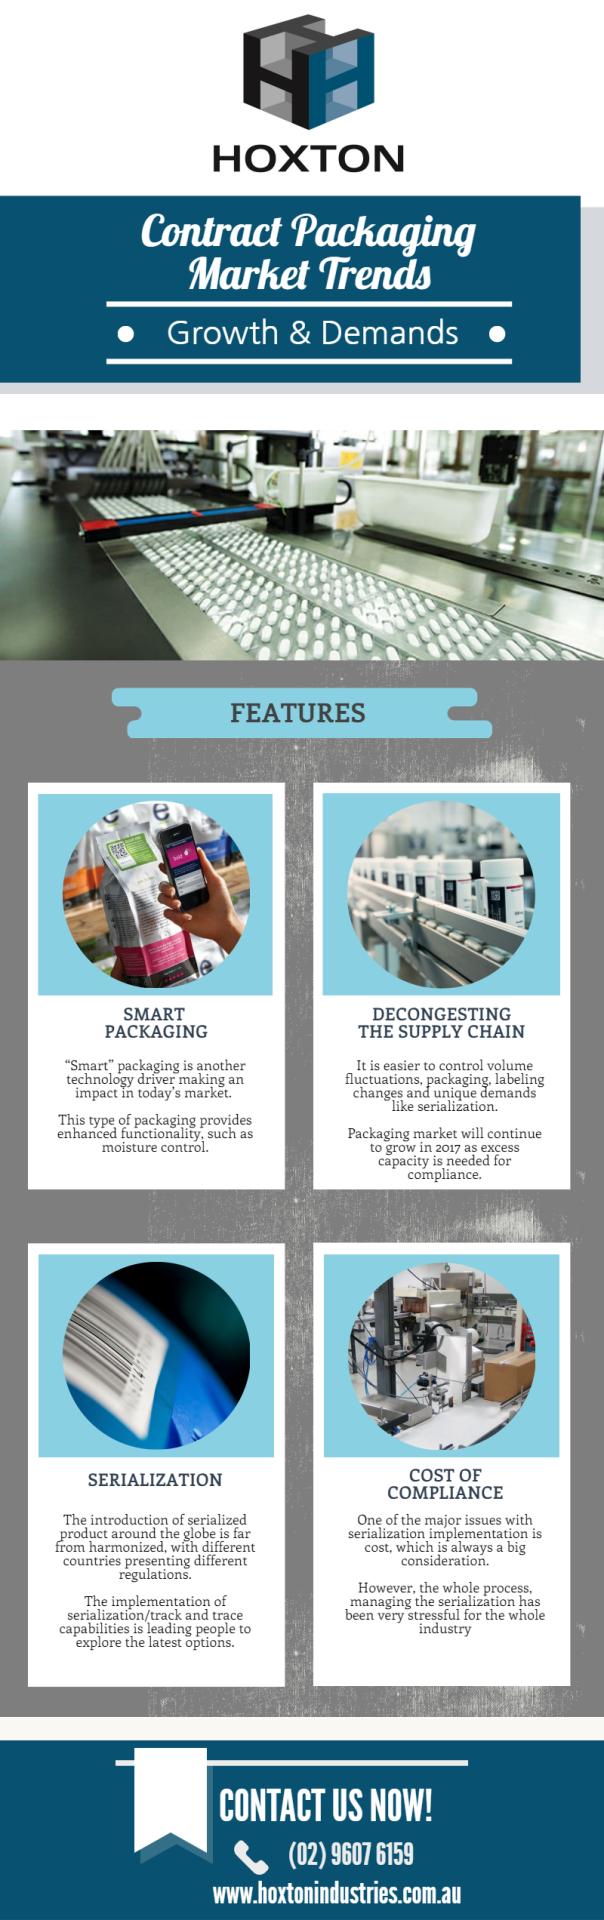 Contract Packaging Market Trends Growth & Demands. #ContractpackagingservicesSydney #CopackerservicesinSydney